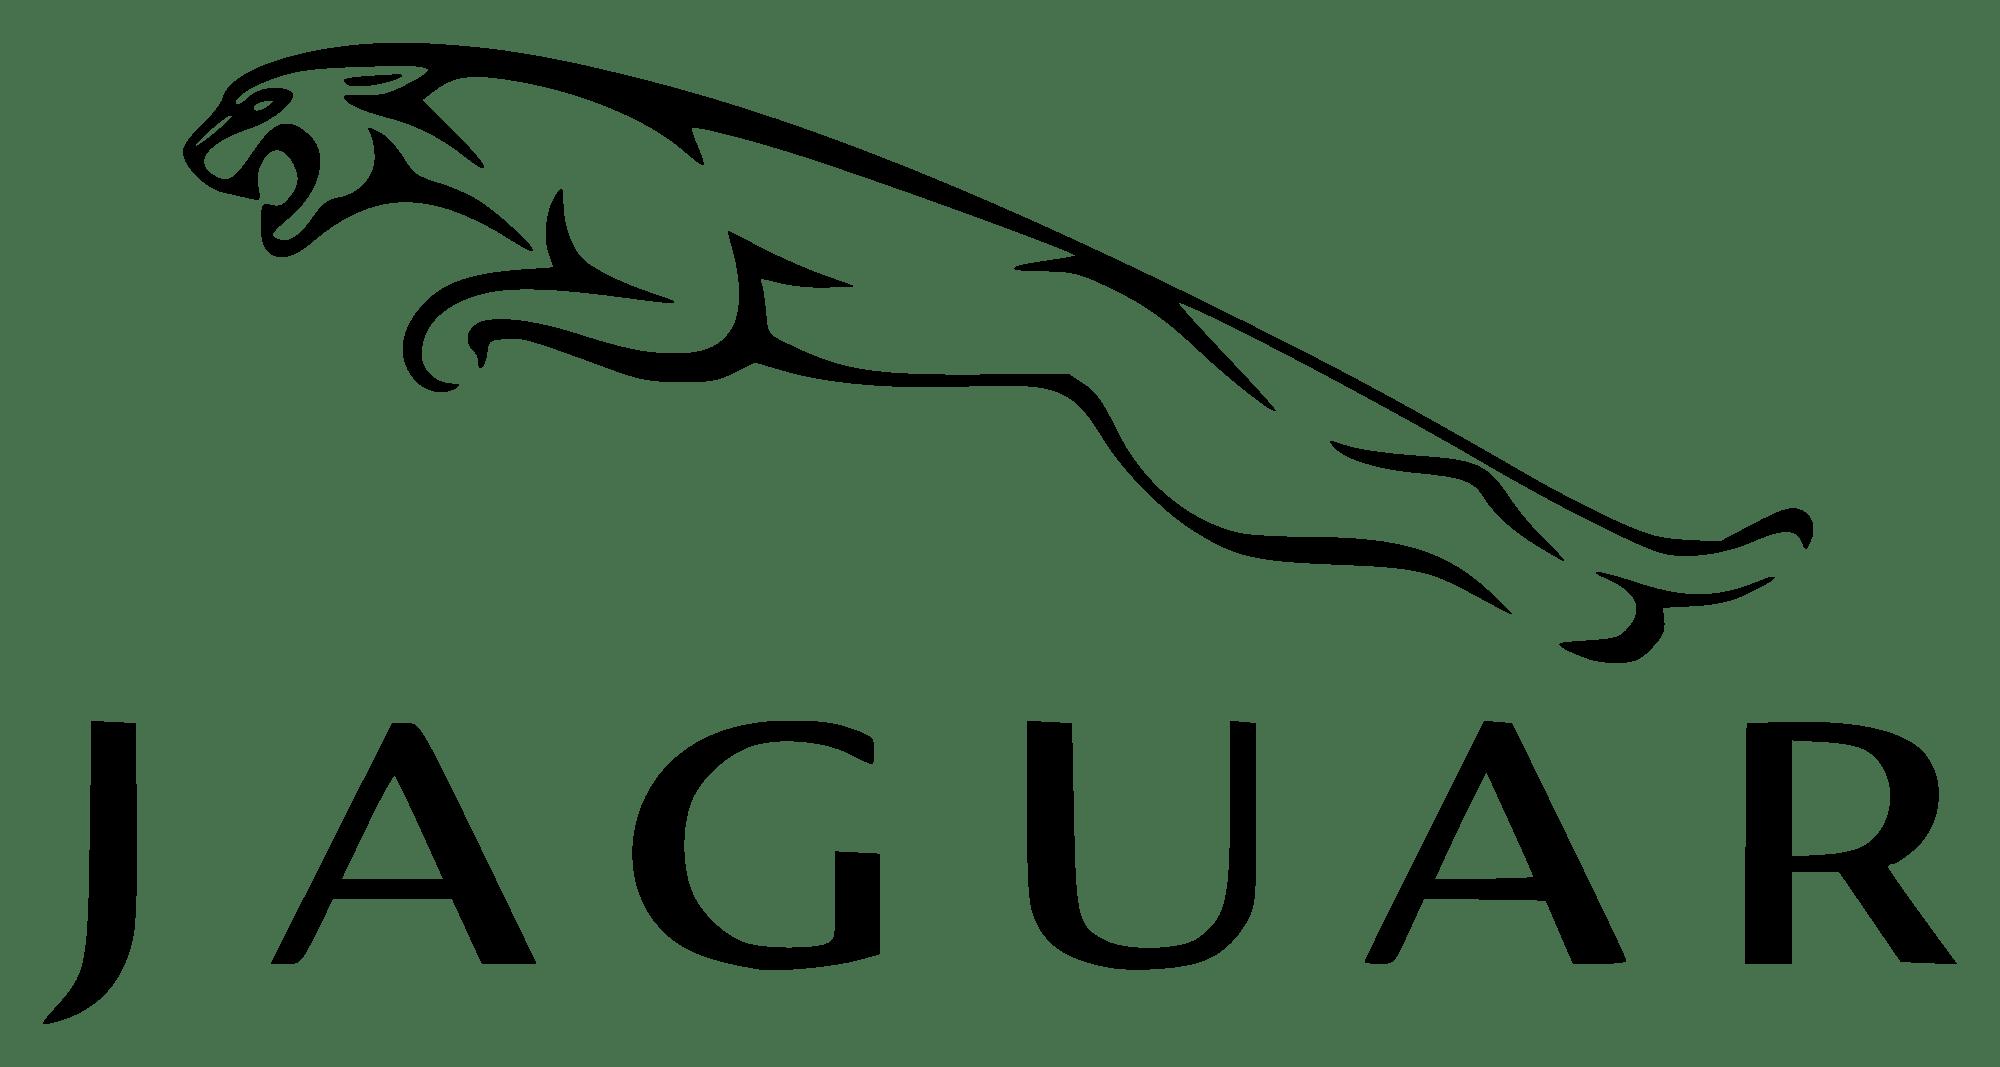 Jaguar Logo Jaguar Car Symbol Meaning And History